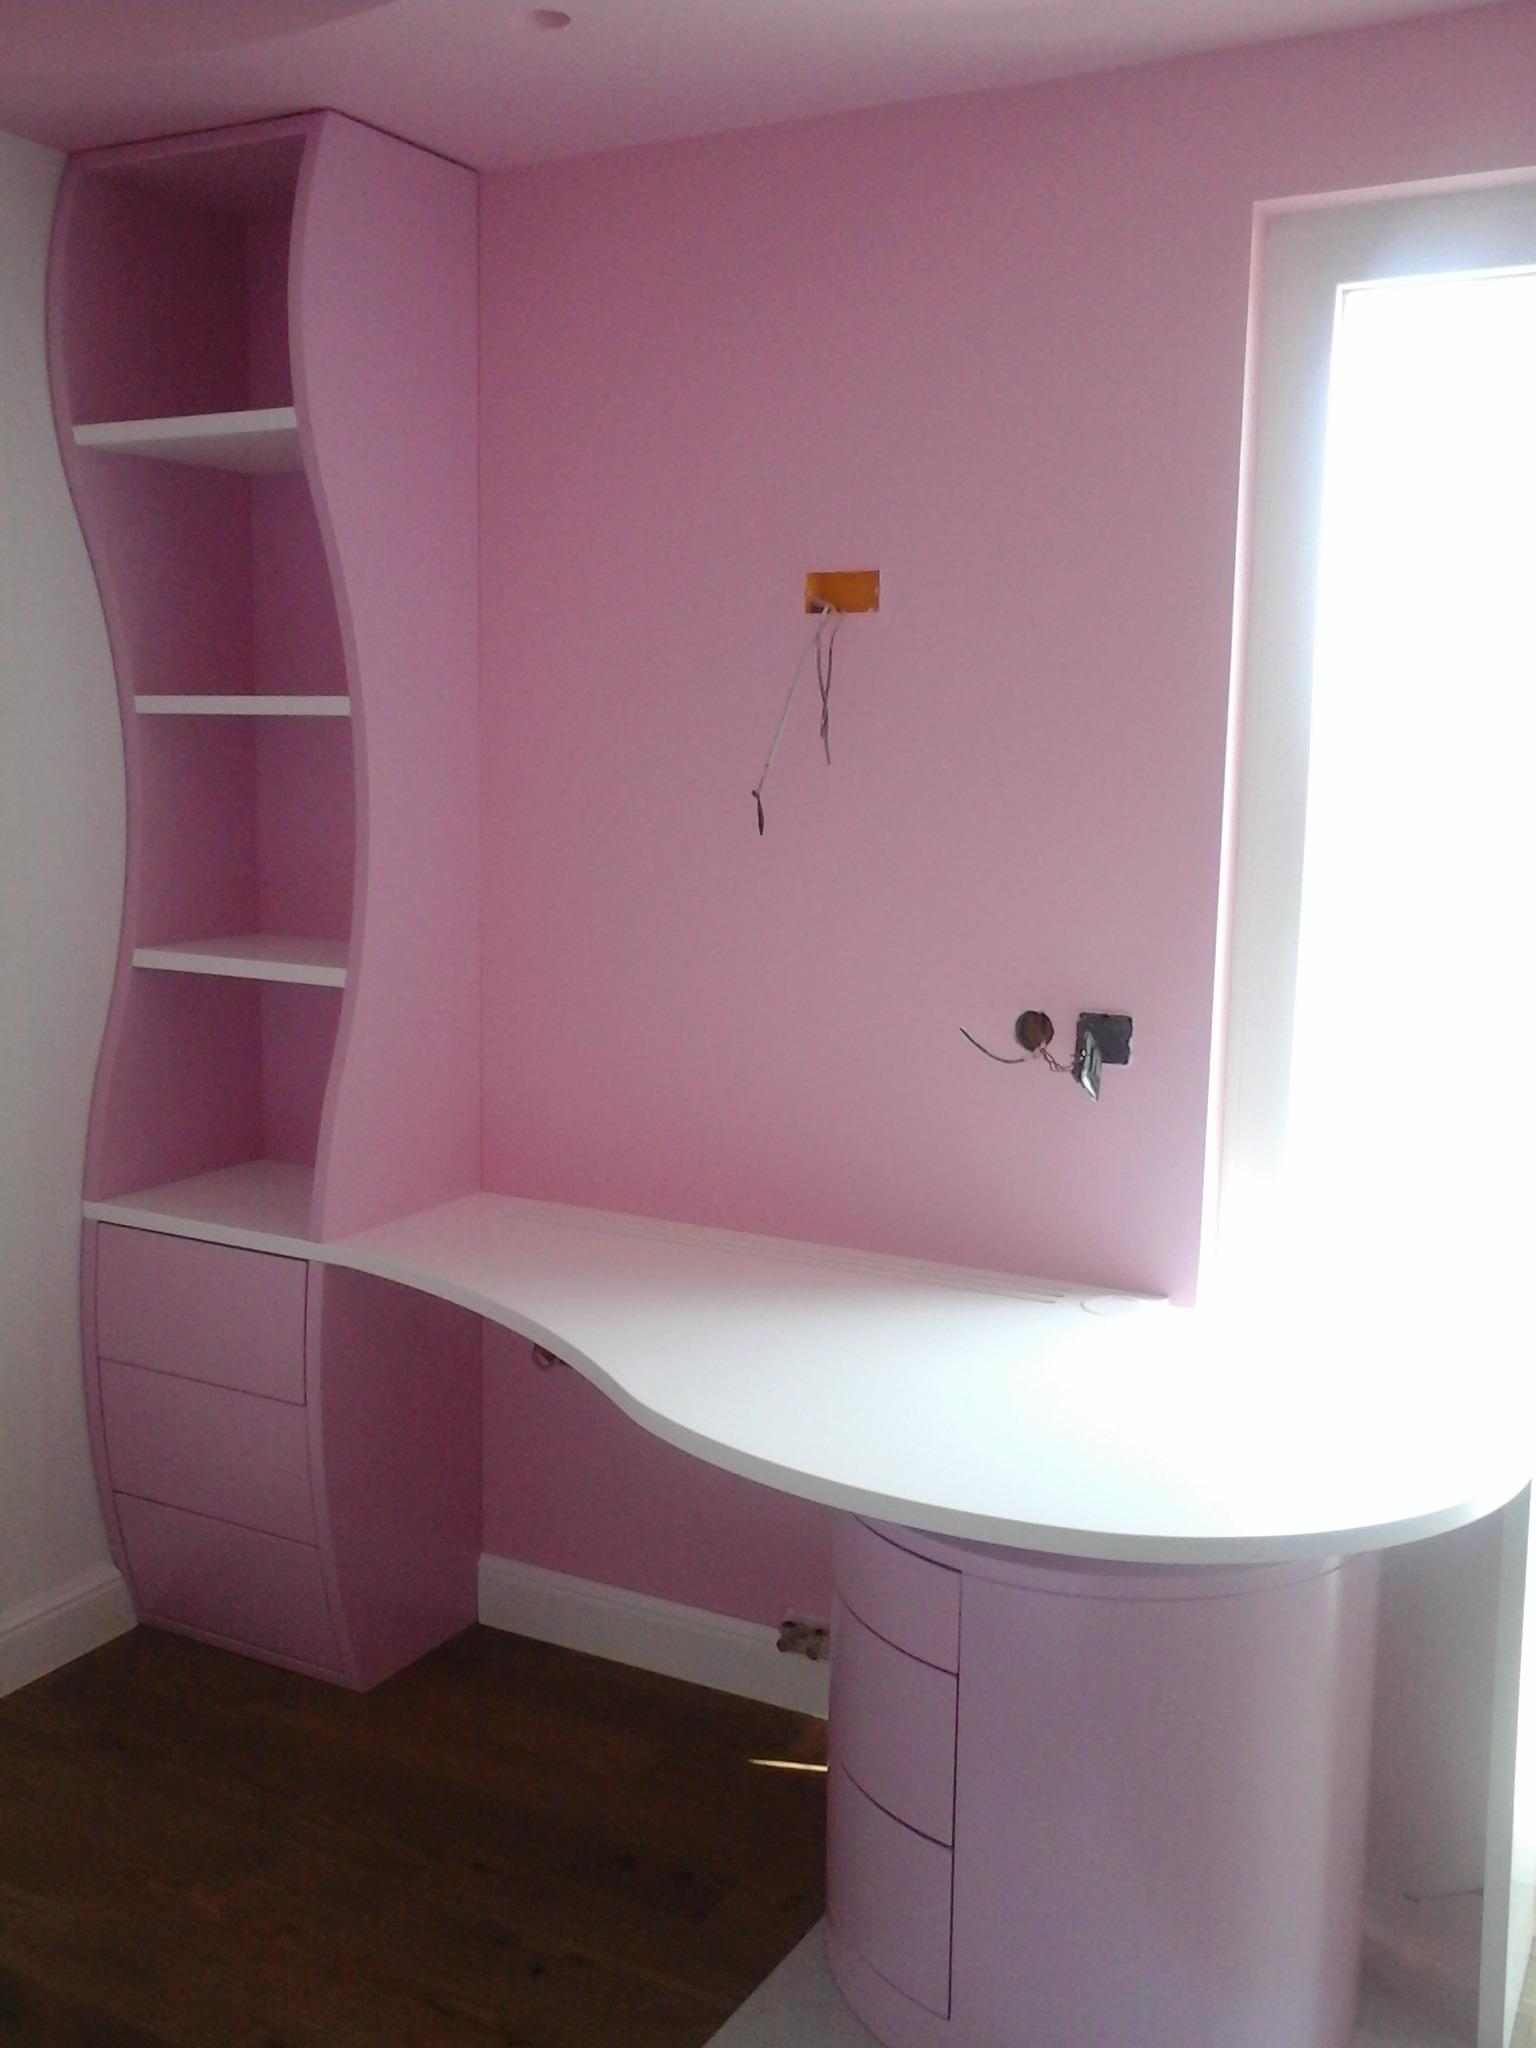 Elegantno pohištvo po meri